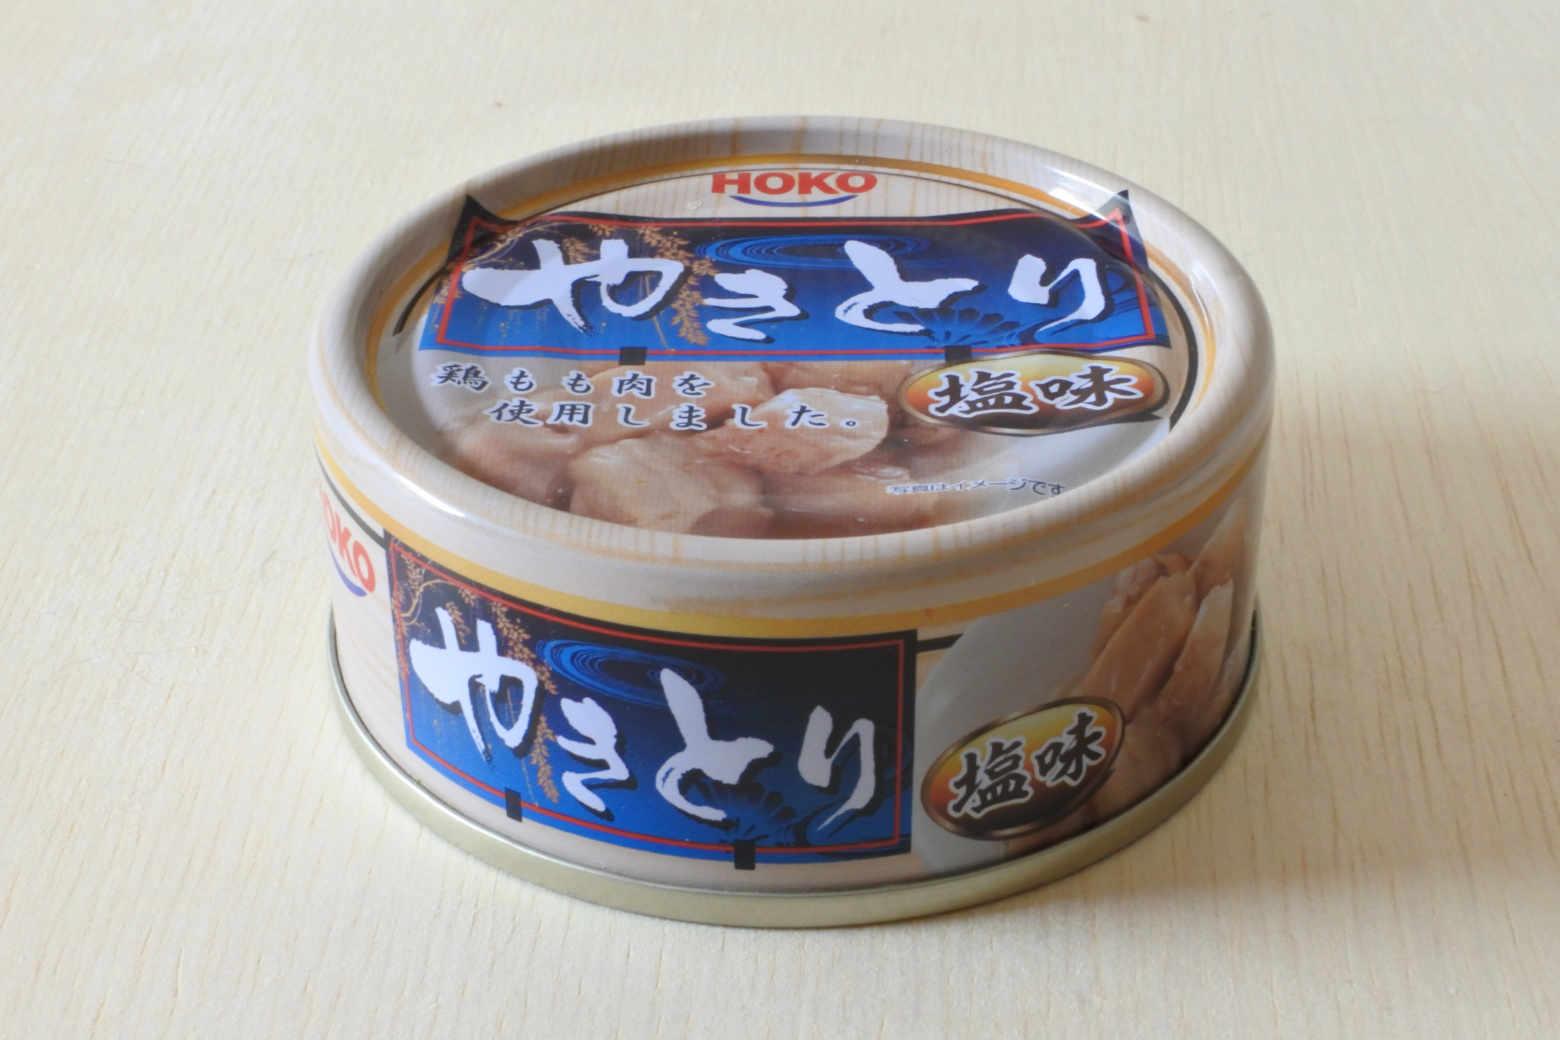 HOKOの『やきとり 塩味』を実食!!!【缶詰】